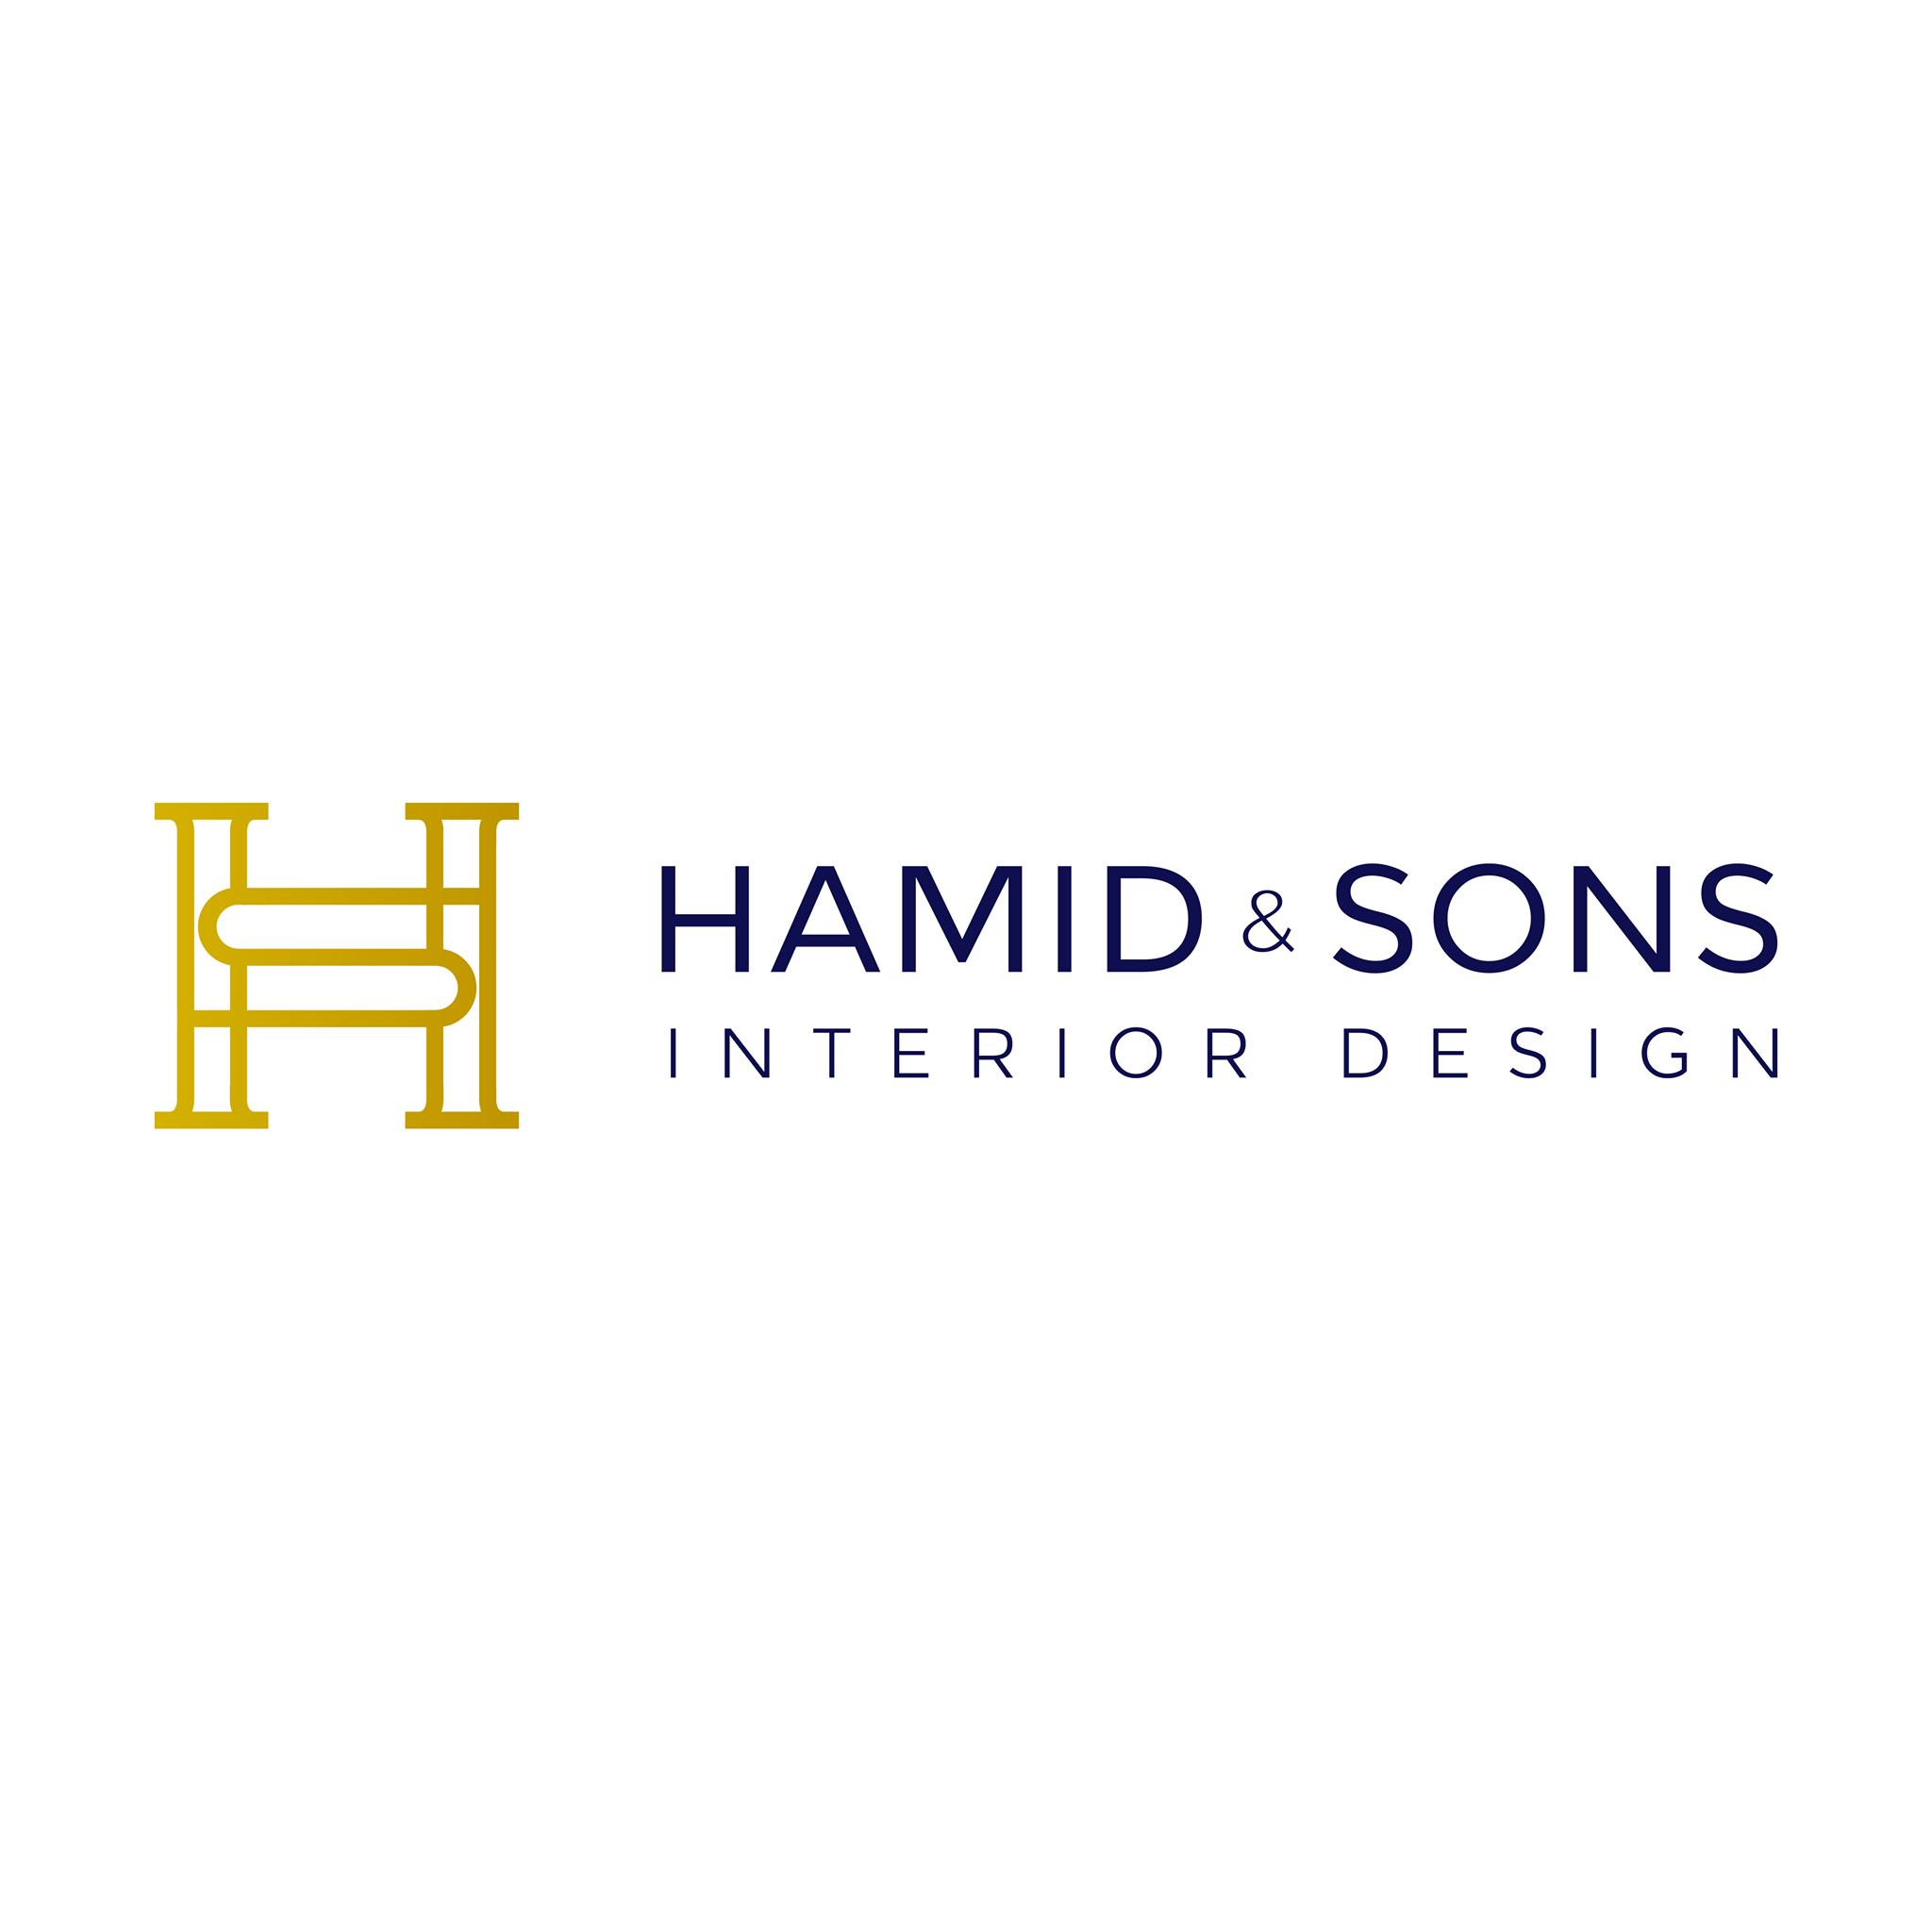 Hamid & Sons Interior Design